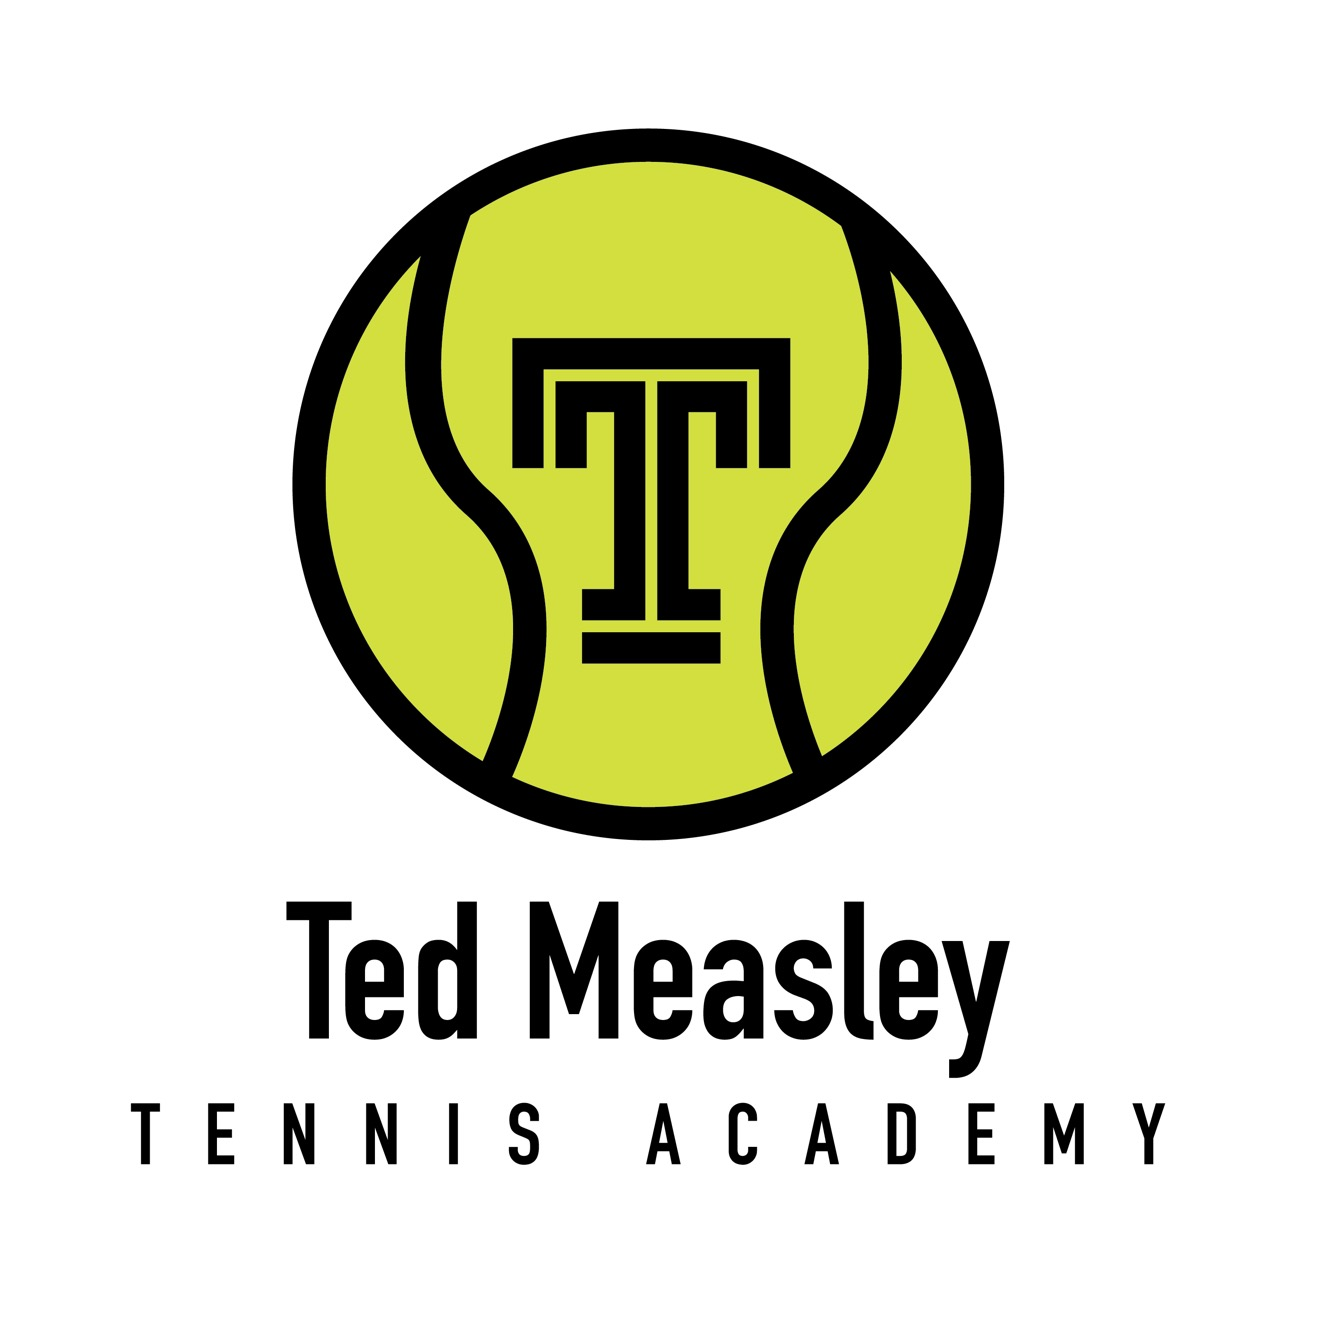 Ted Measley Tennis